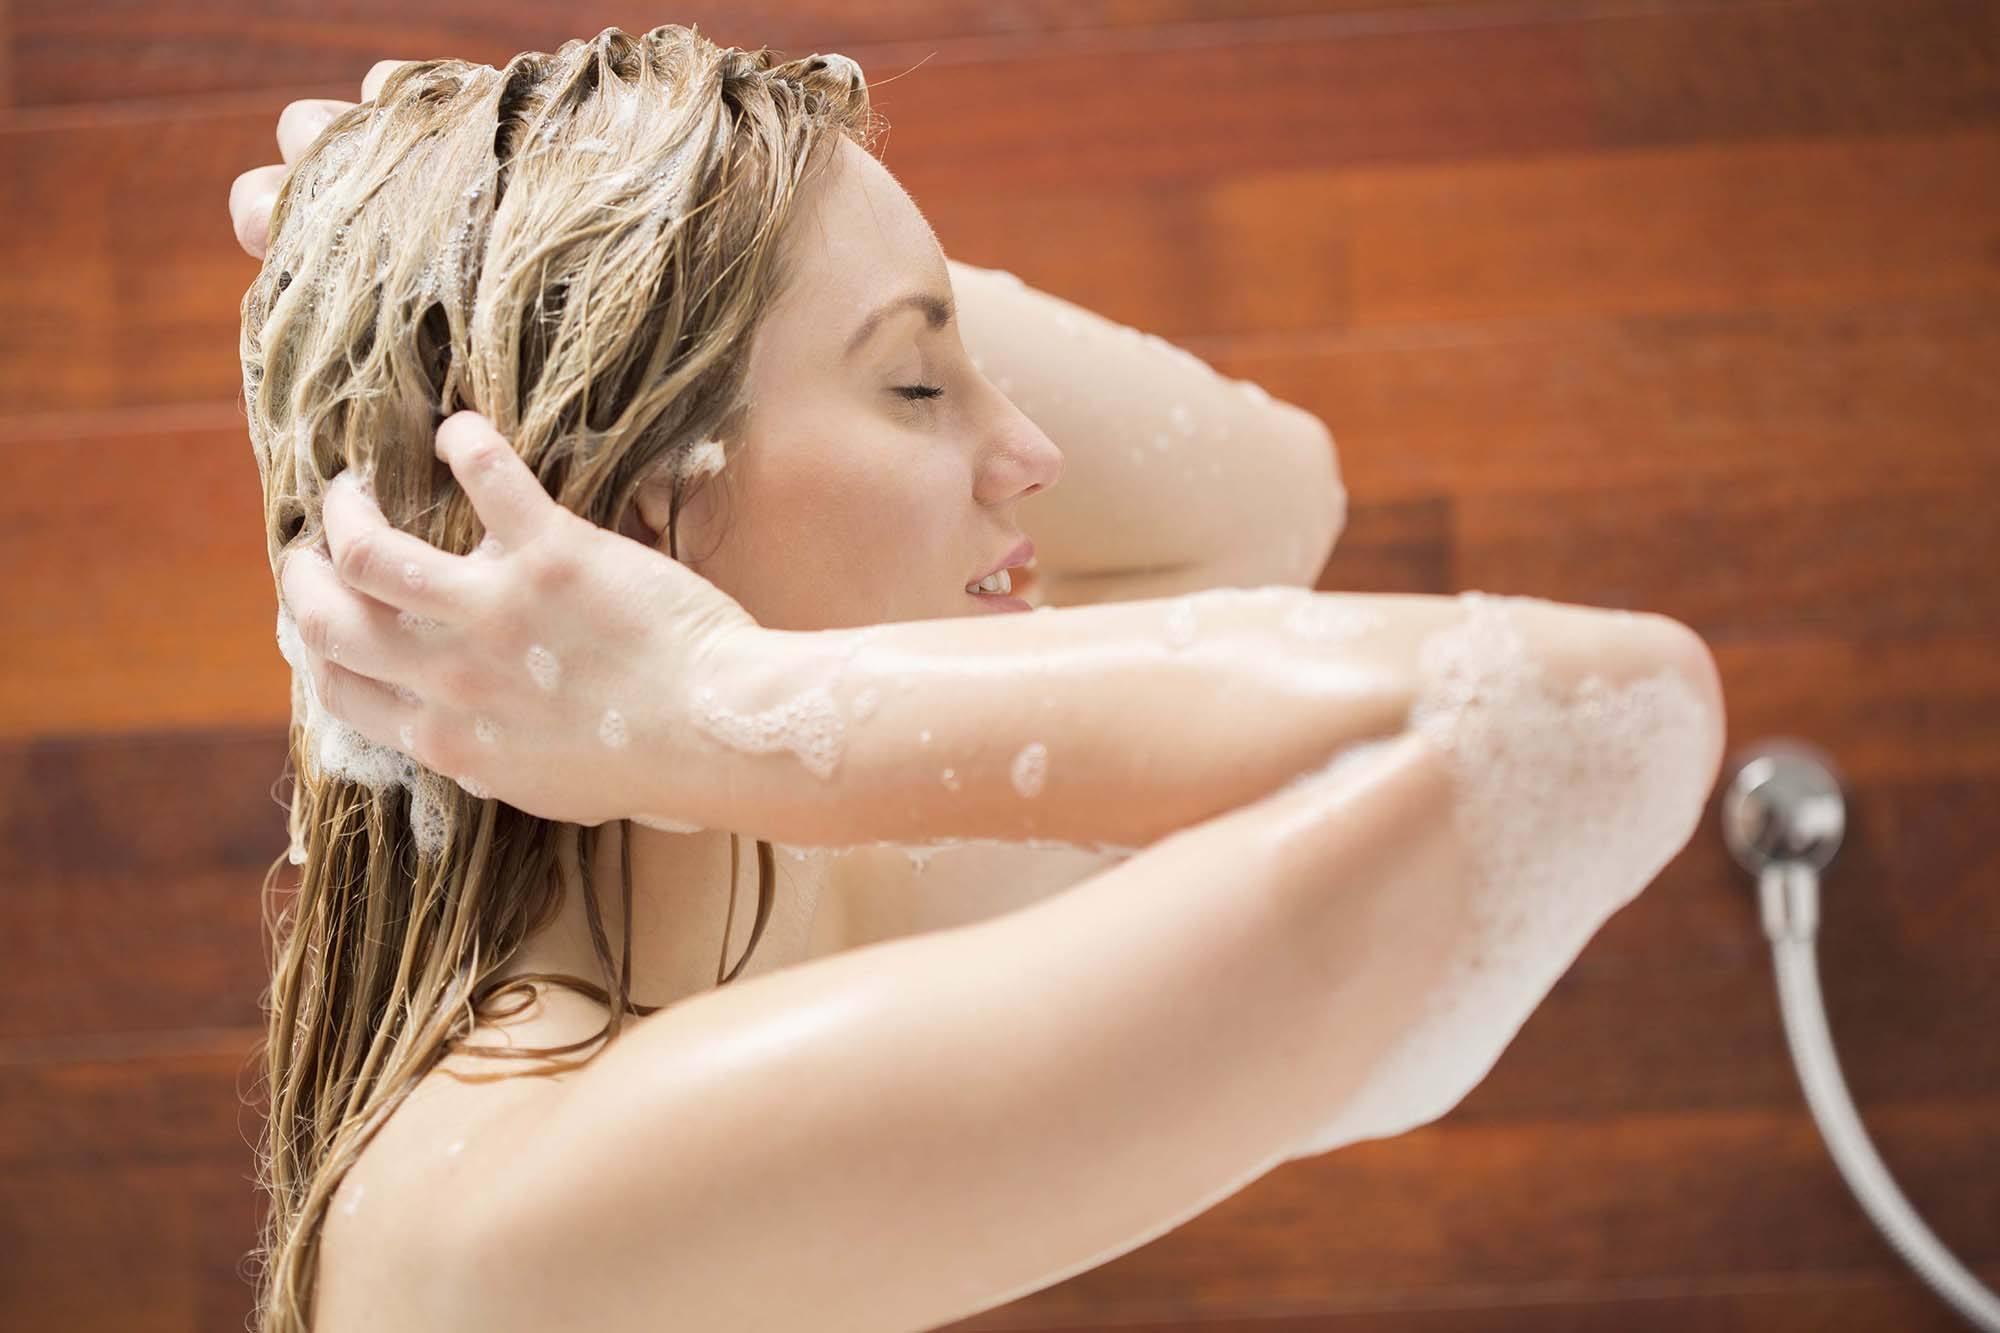 hair masks: All Things Hair - IMAGE - wet hair washing